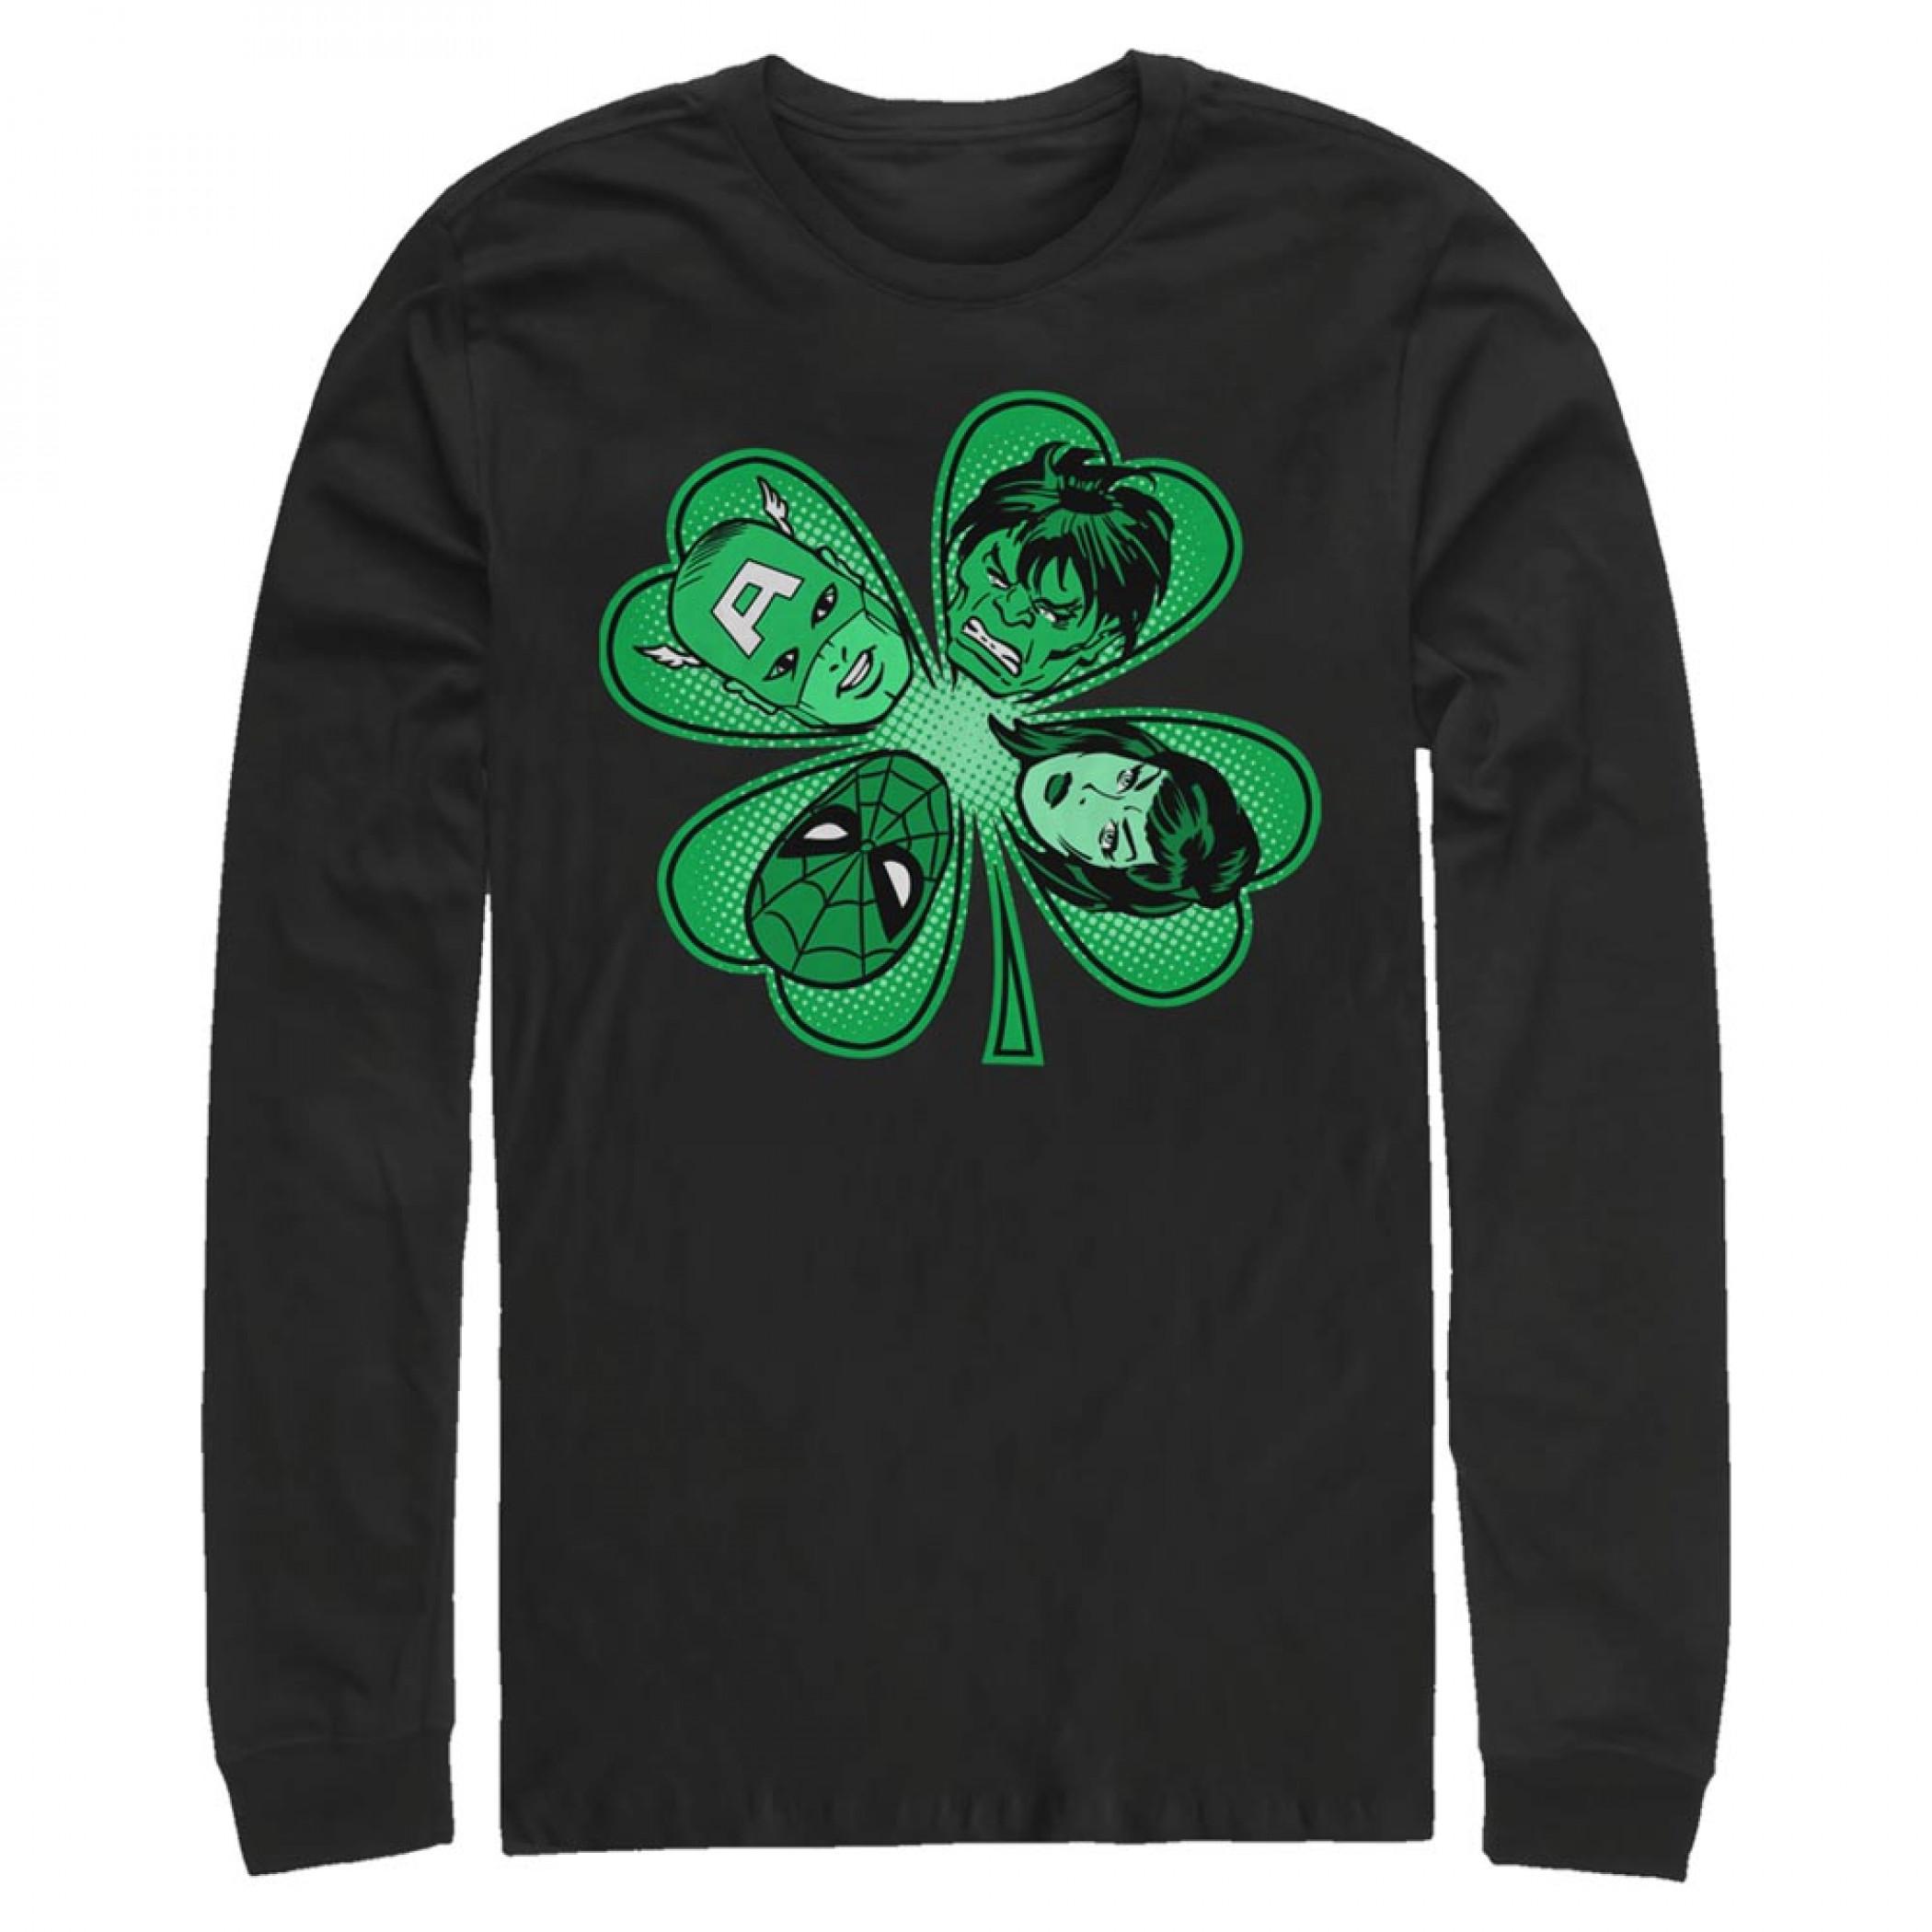 Avengers Heroes Shamrock Black Long Sleeve Shirt